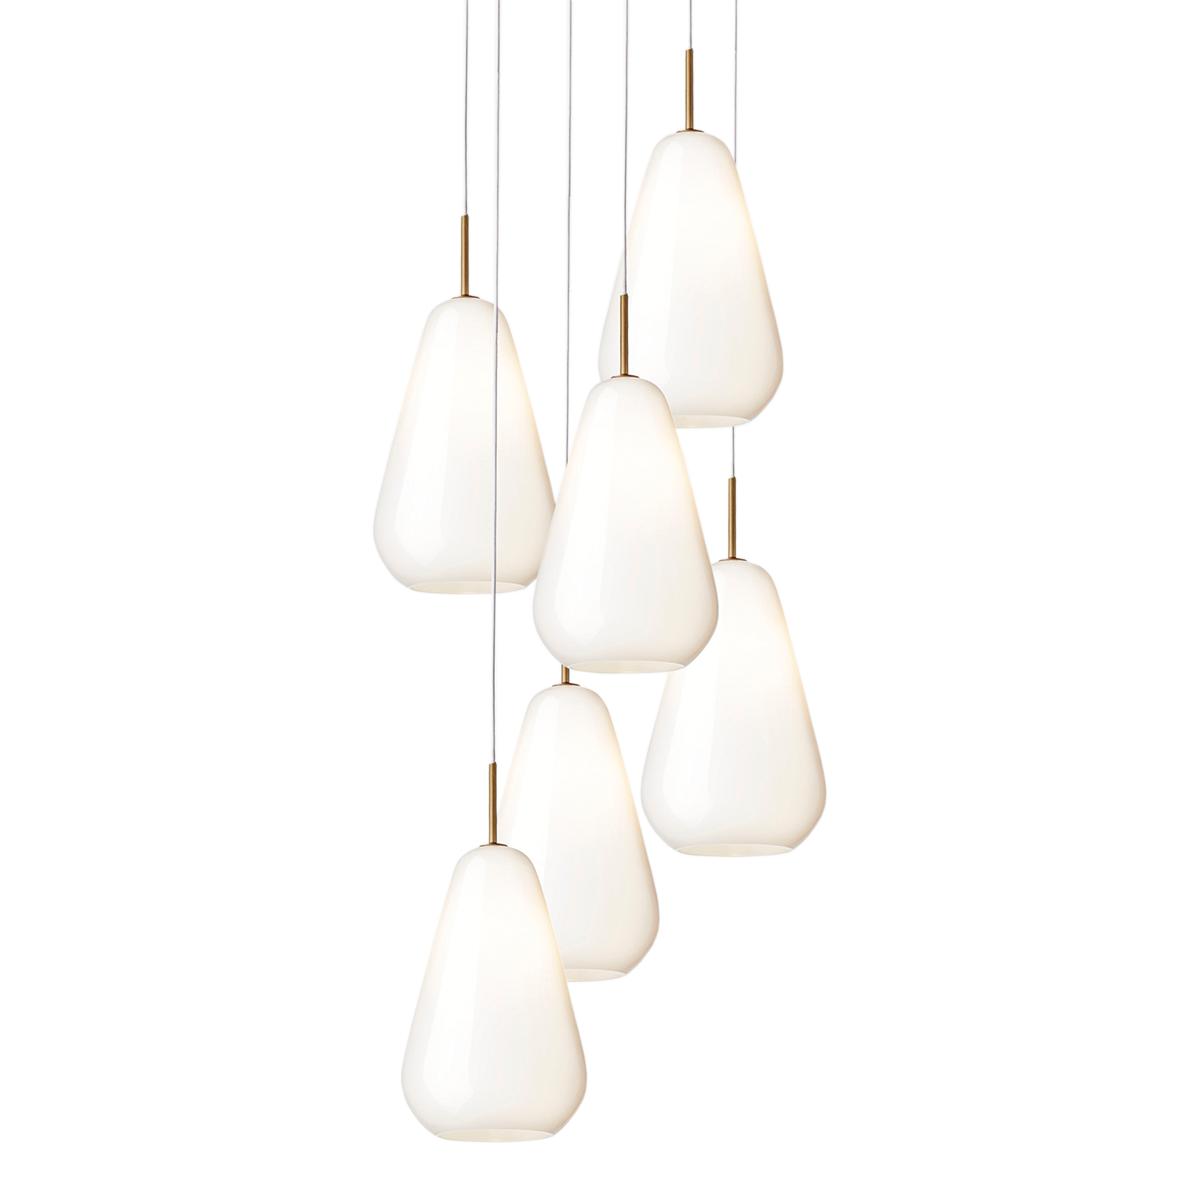 Nuura Anoli 6 Hanglamp G9 - Nordic Gold - Opal White